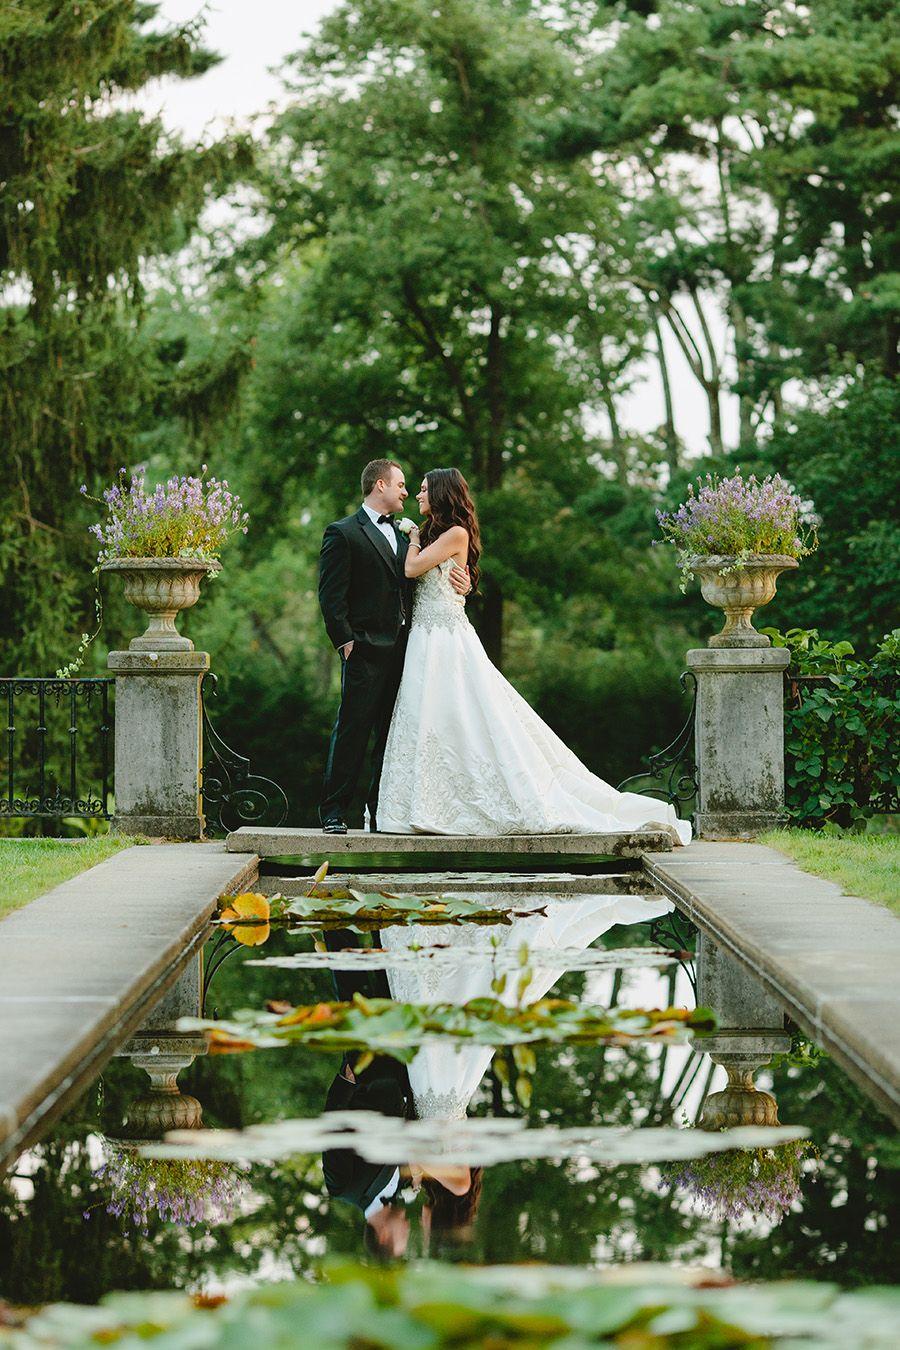 Elegant Wedding Photography: Elegant Garden Wedding Photos At New Jersey Botanical